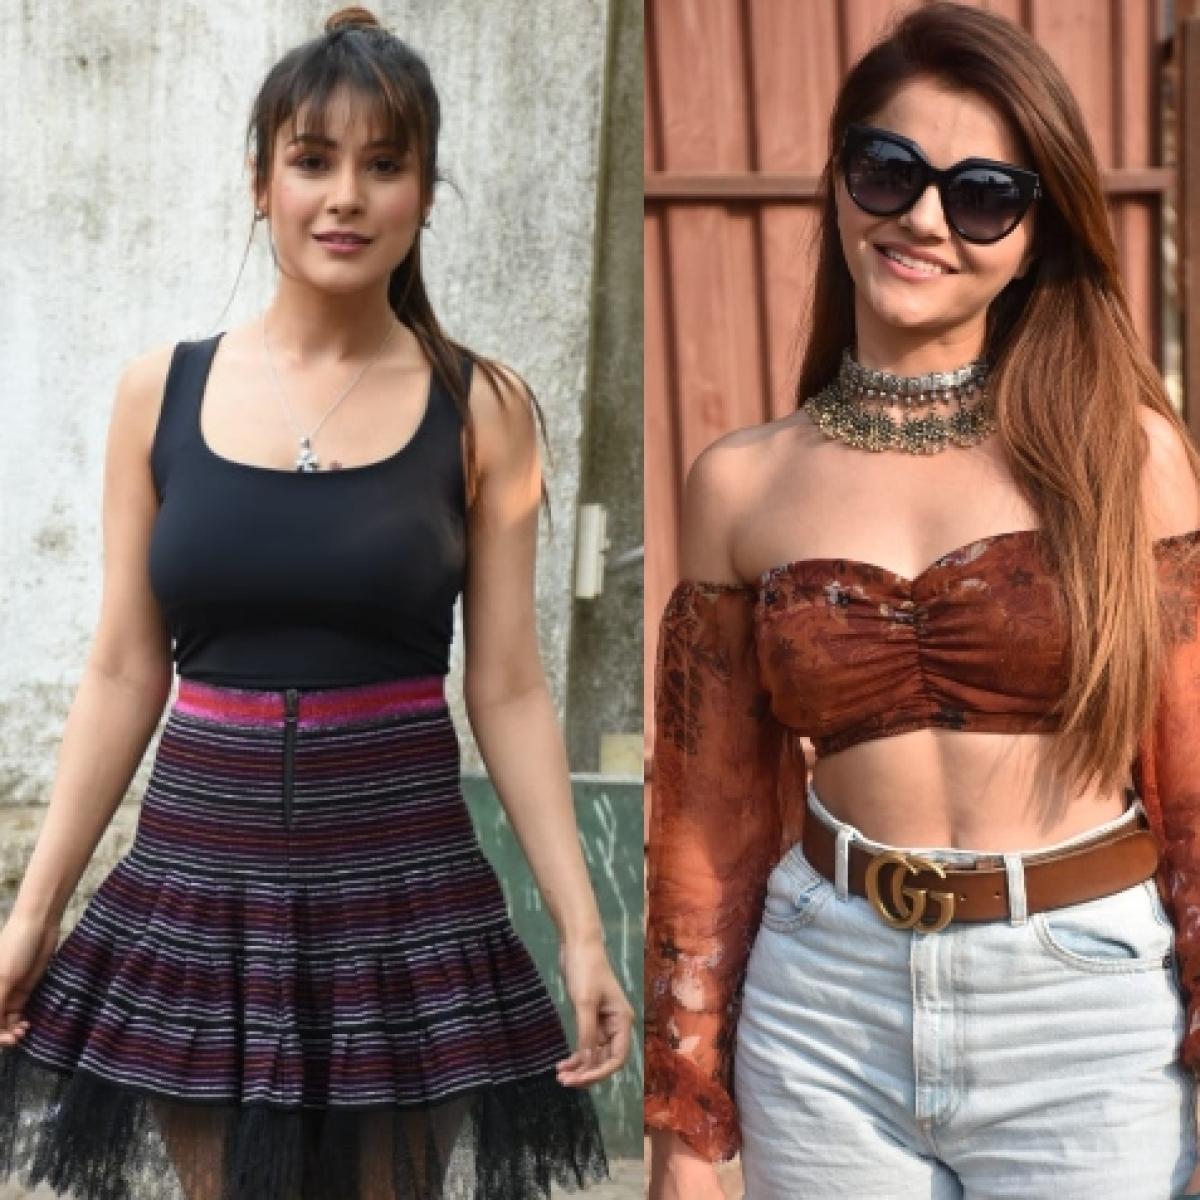 Paparazzi Files: 'Bigg Boss' beauties Shehnaaz Gill, Rubina Dilaik, Hina Khan and others spotted in Mumbai